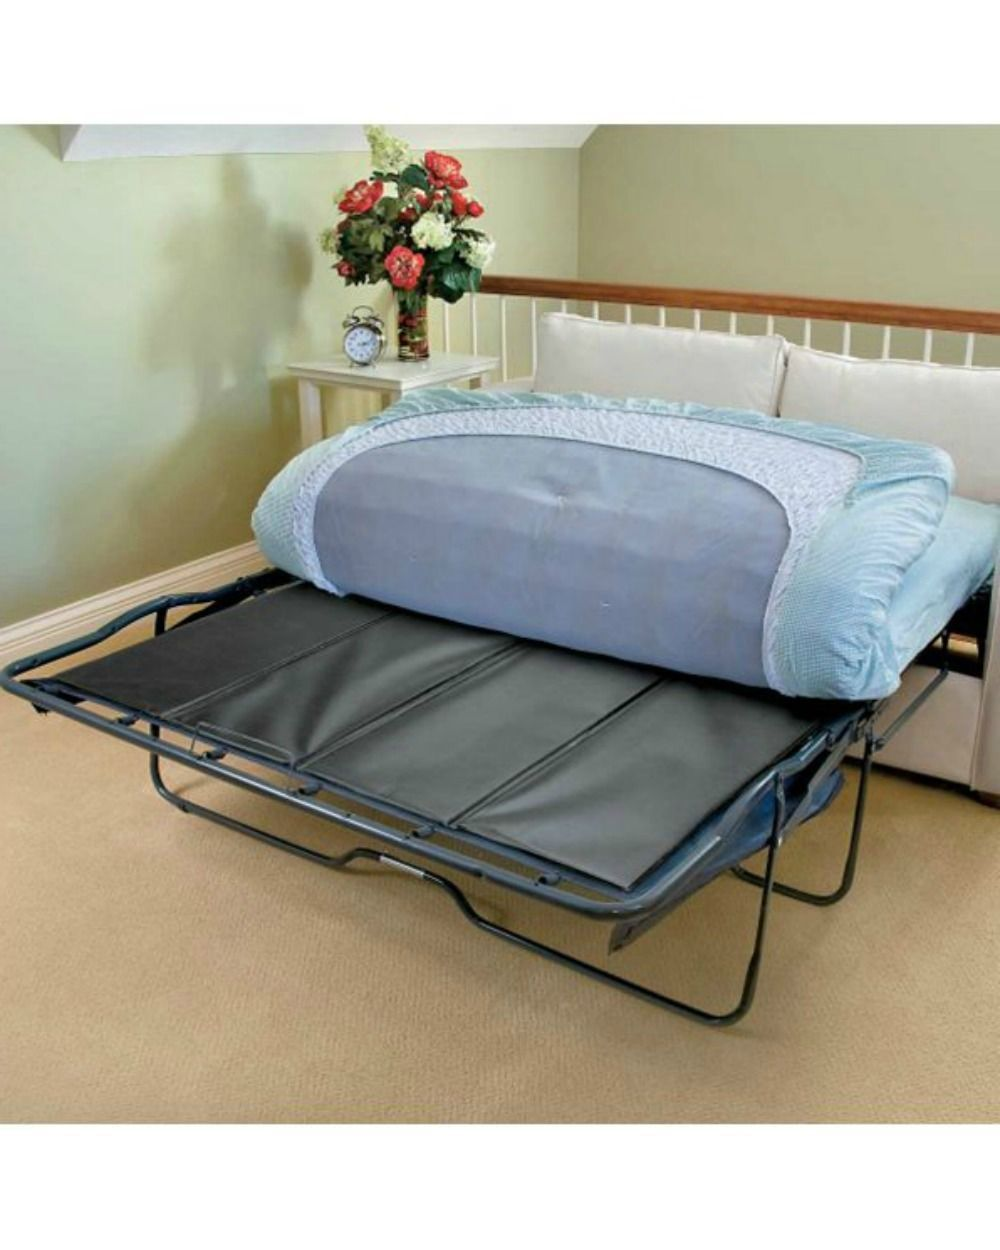 Sleeper Sofa Bed Bar Shield Folding Support Board For Under  ~ Sofa Bed Mattress Boards